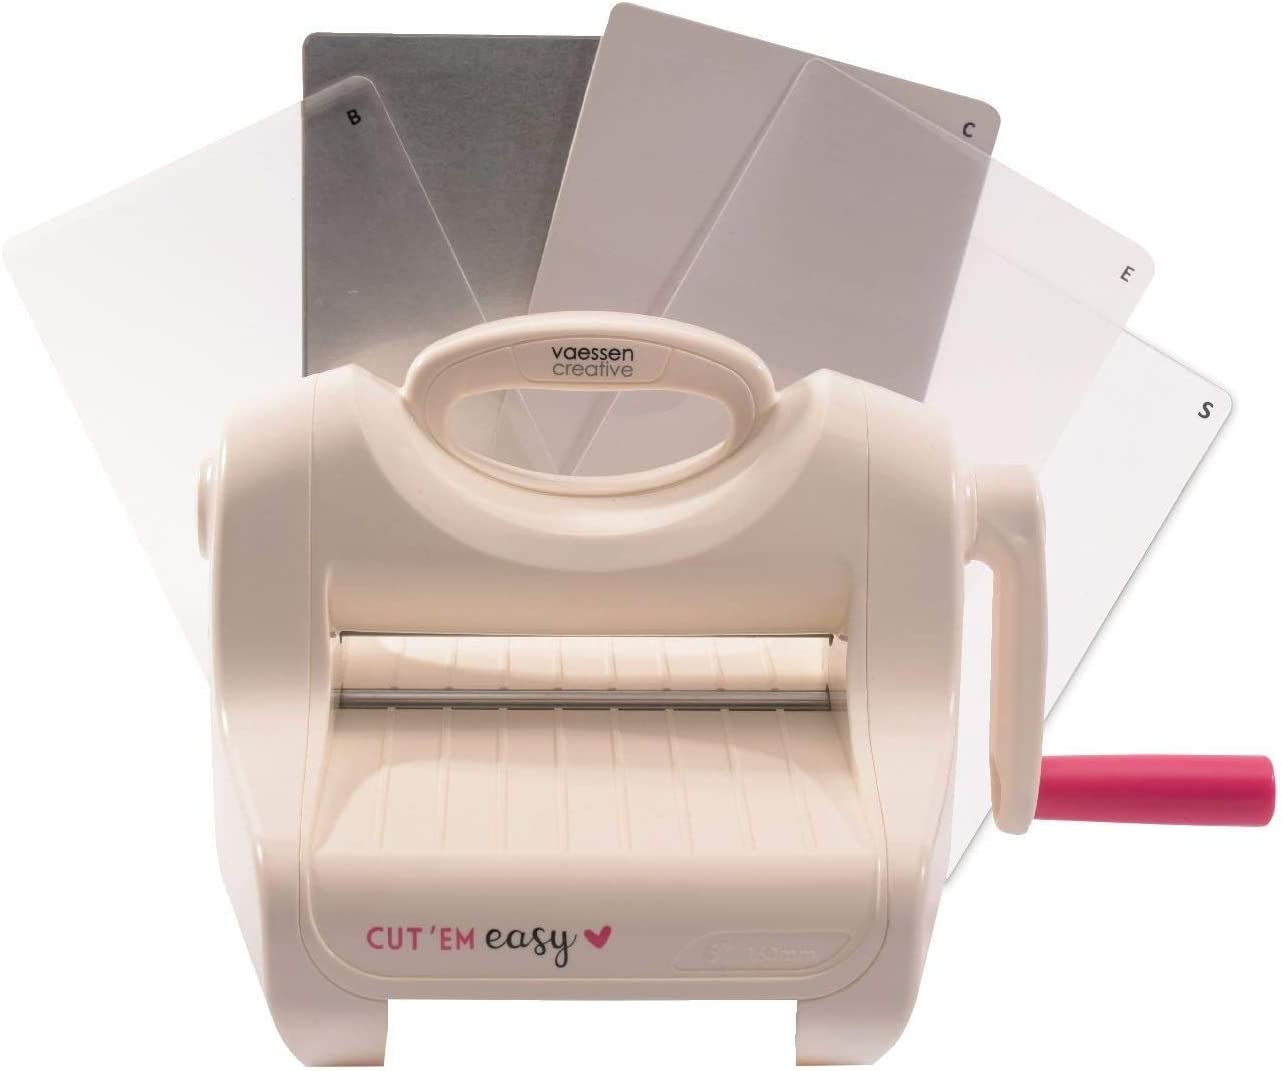 Vaessen Creative 2137-054 Kit di Base Macchina Fustellatrice e per Embossing Cut ˈEm Easy Large A5 6 15 cm Bianco//Rosa